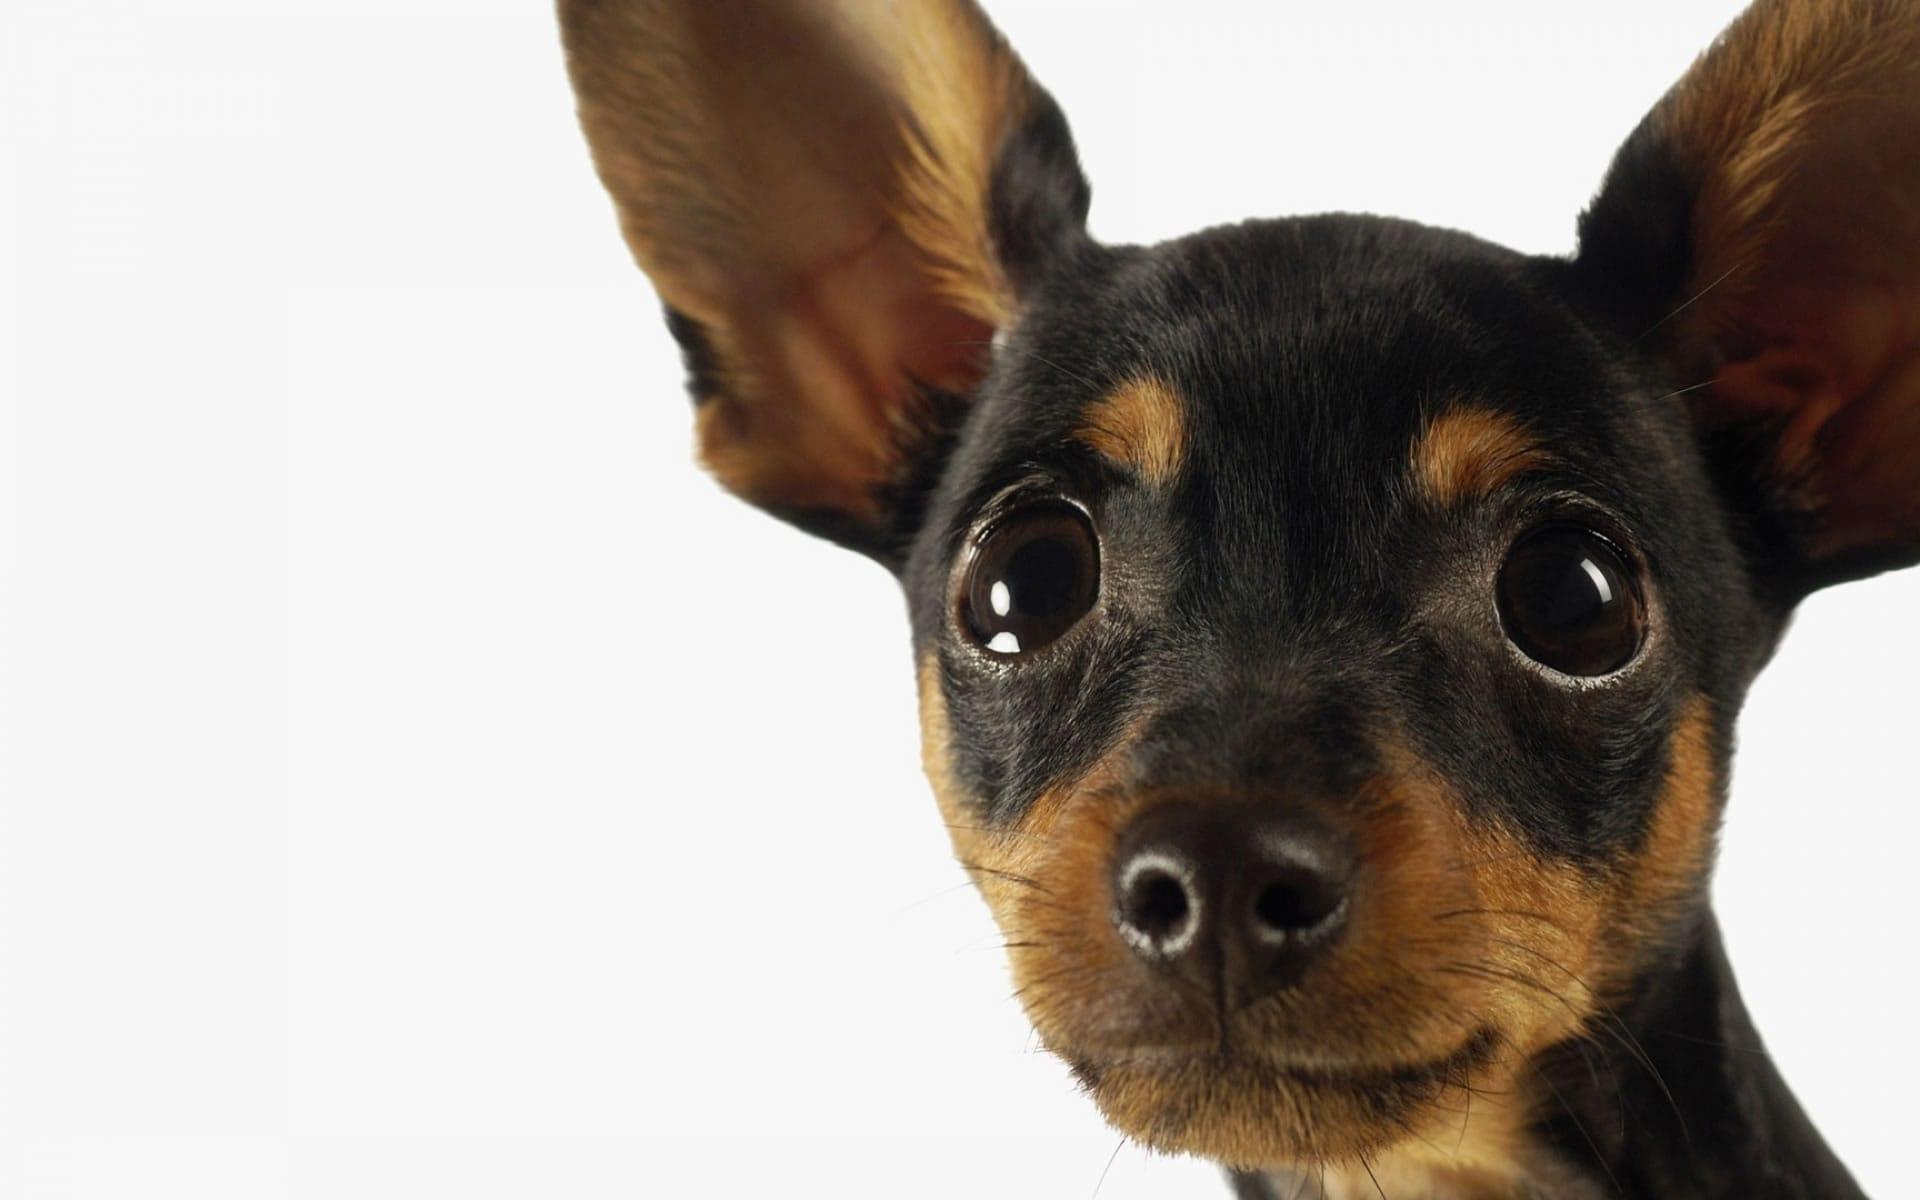 Cute Pitbull Puppies Wallpapers Miniature Pinscher Hd Wallpapers 7wallpapers Net